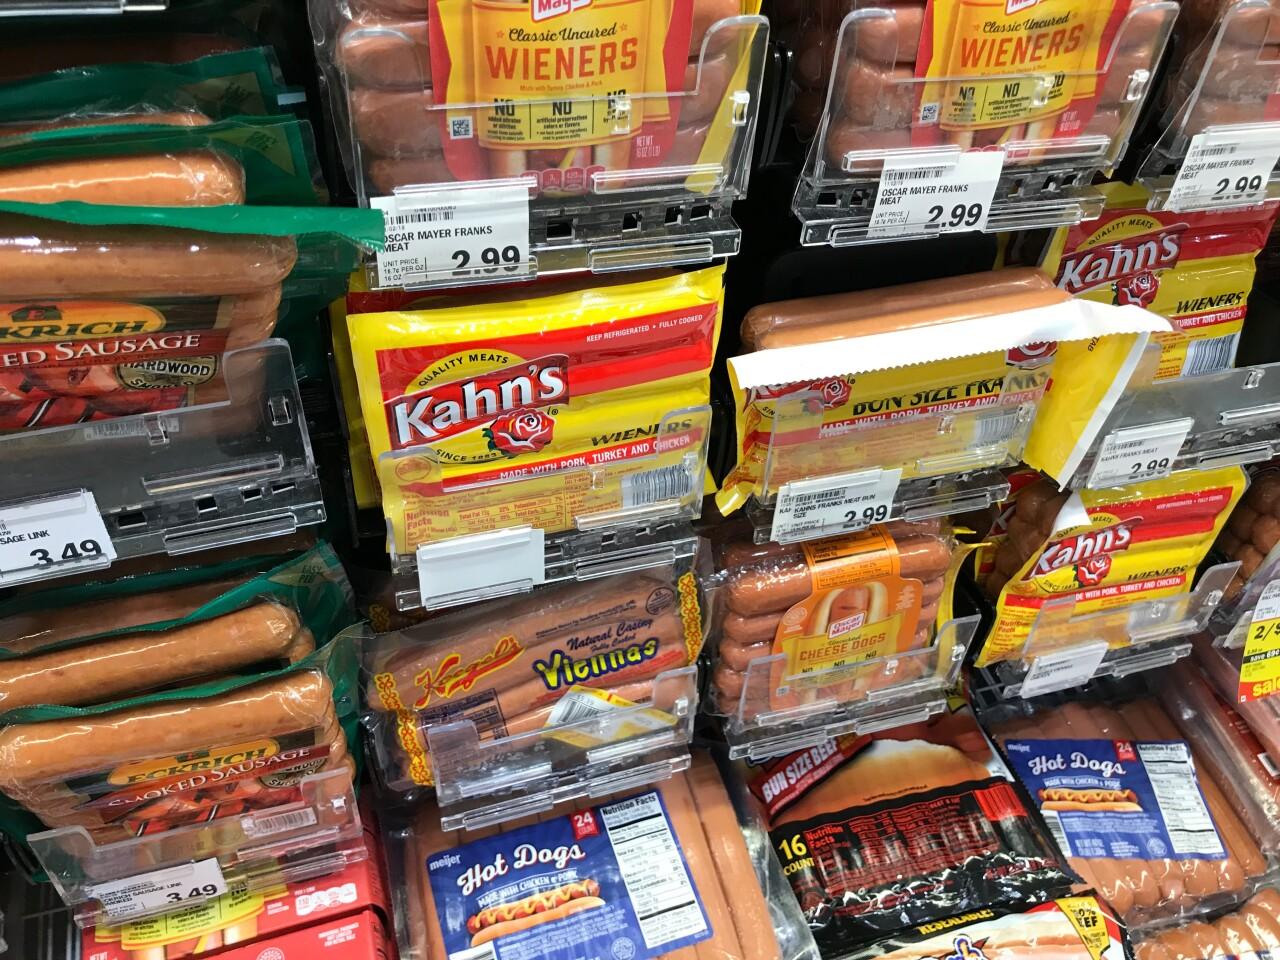 Kahn's hot dogs